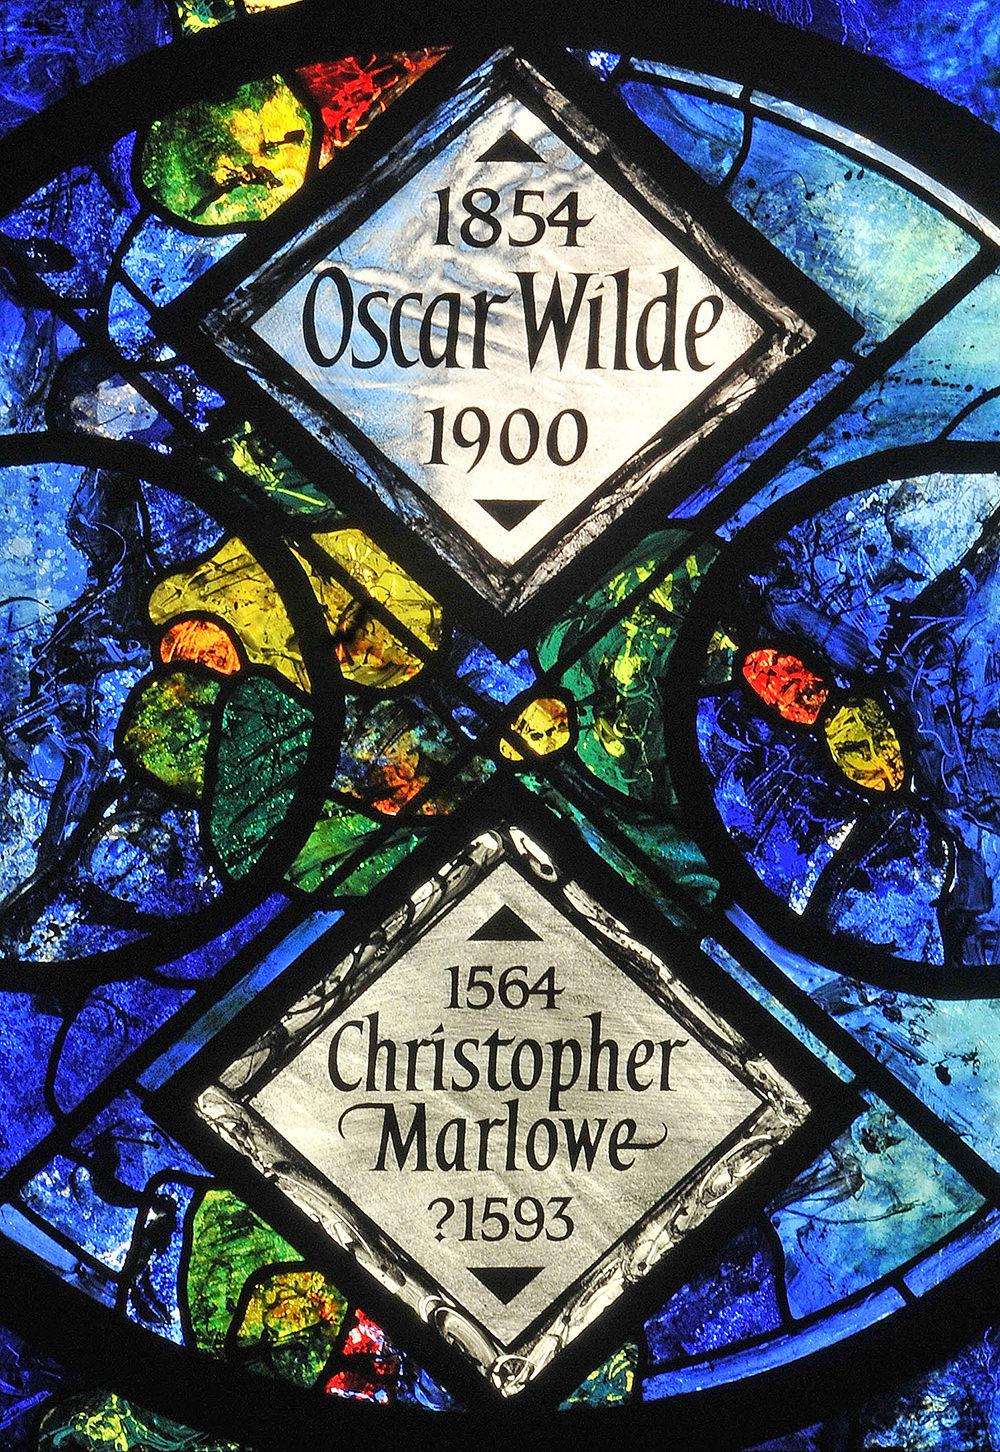 memorial-window-oscar-wilde-christopher-marlowe